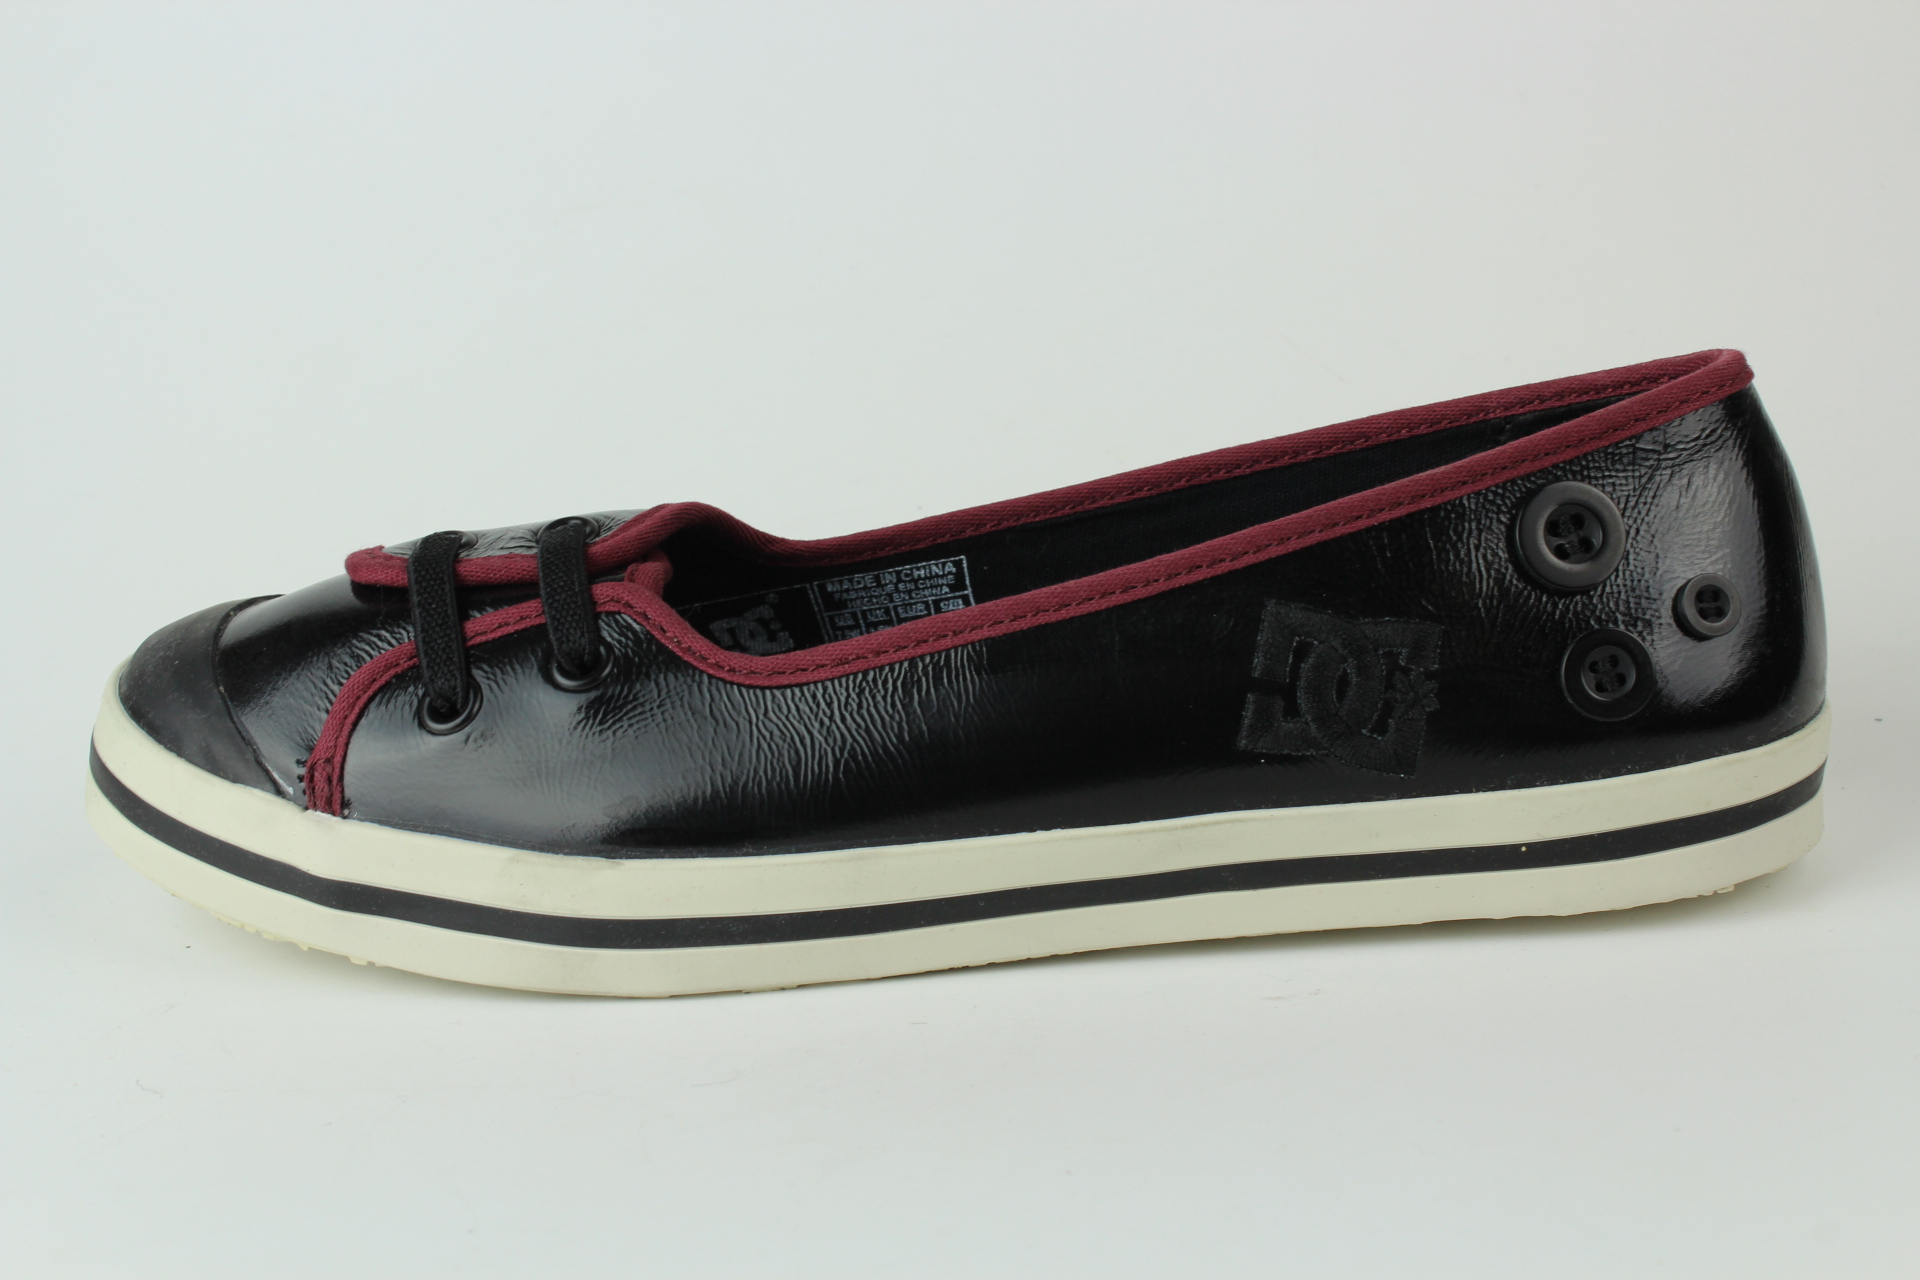 dc shoes w s venice l lx damen slipper sneaker gr 38 5 uk 5 5 301953 schwarz ebay. Black Bedroom Furniture Sets. Home Design Ideas